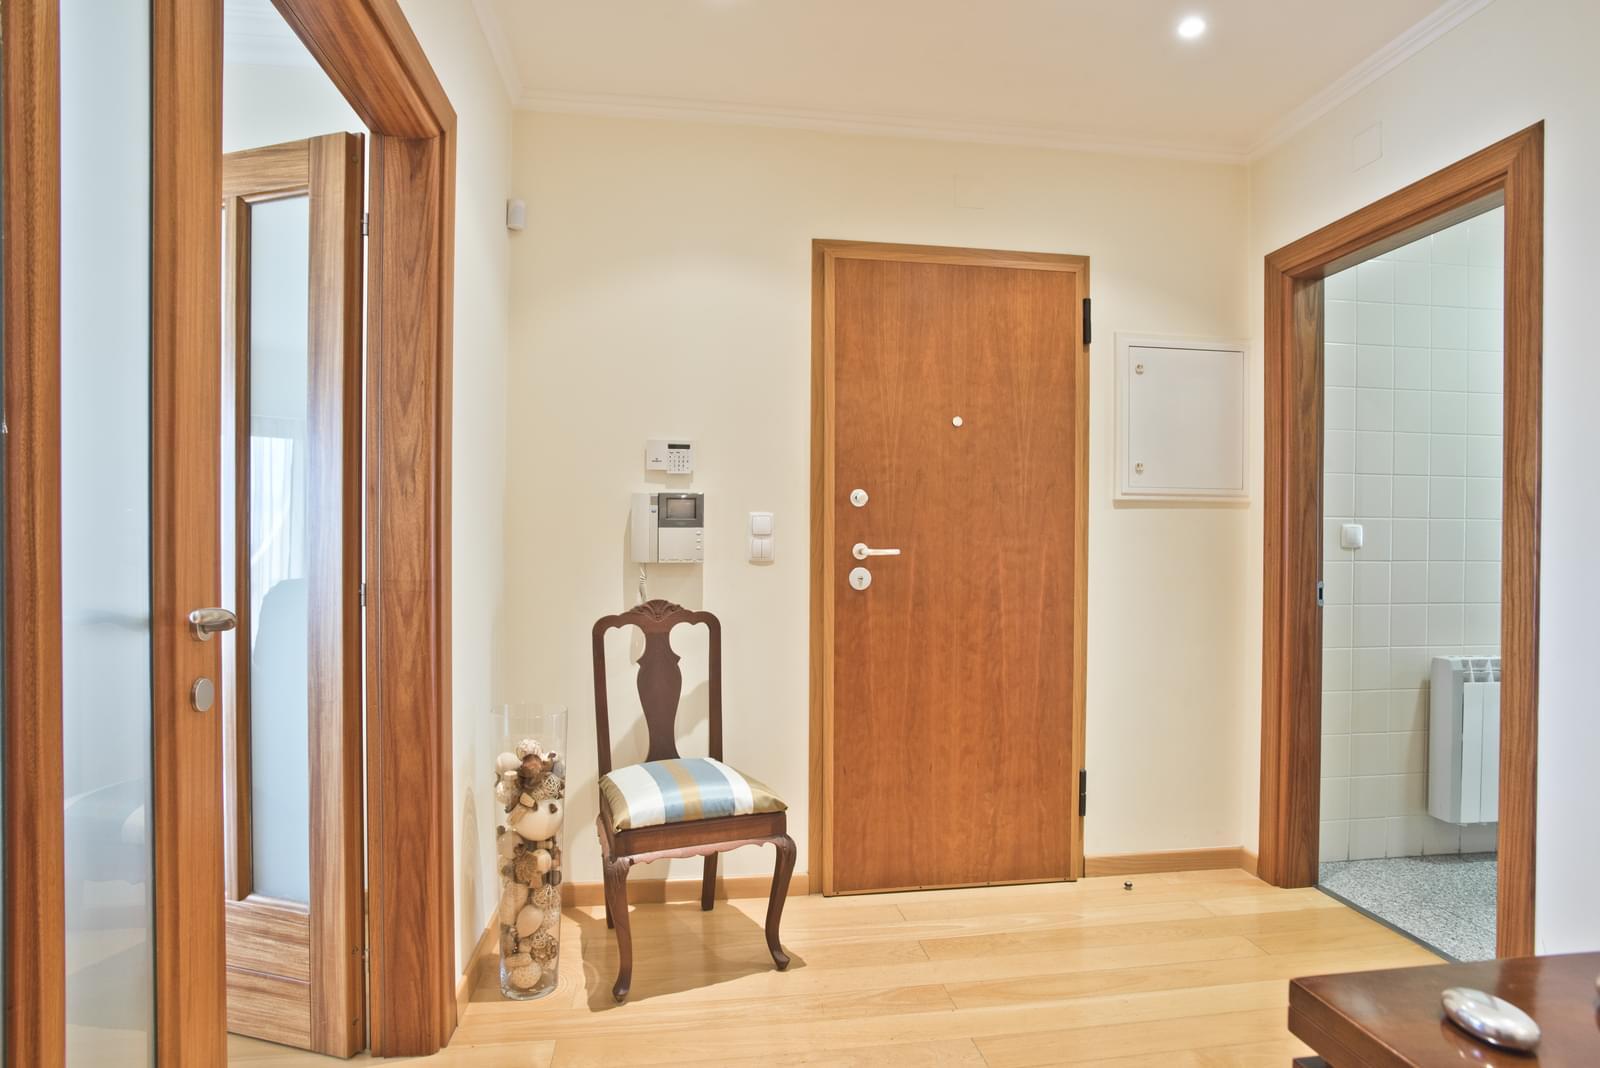 pf17004-apartamento-t3-cascais-6bc0e7d4-0e5c-4bff-8087-8e9e2349ad21